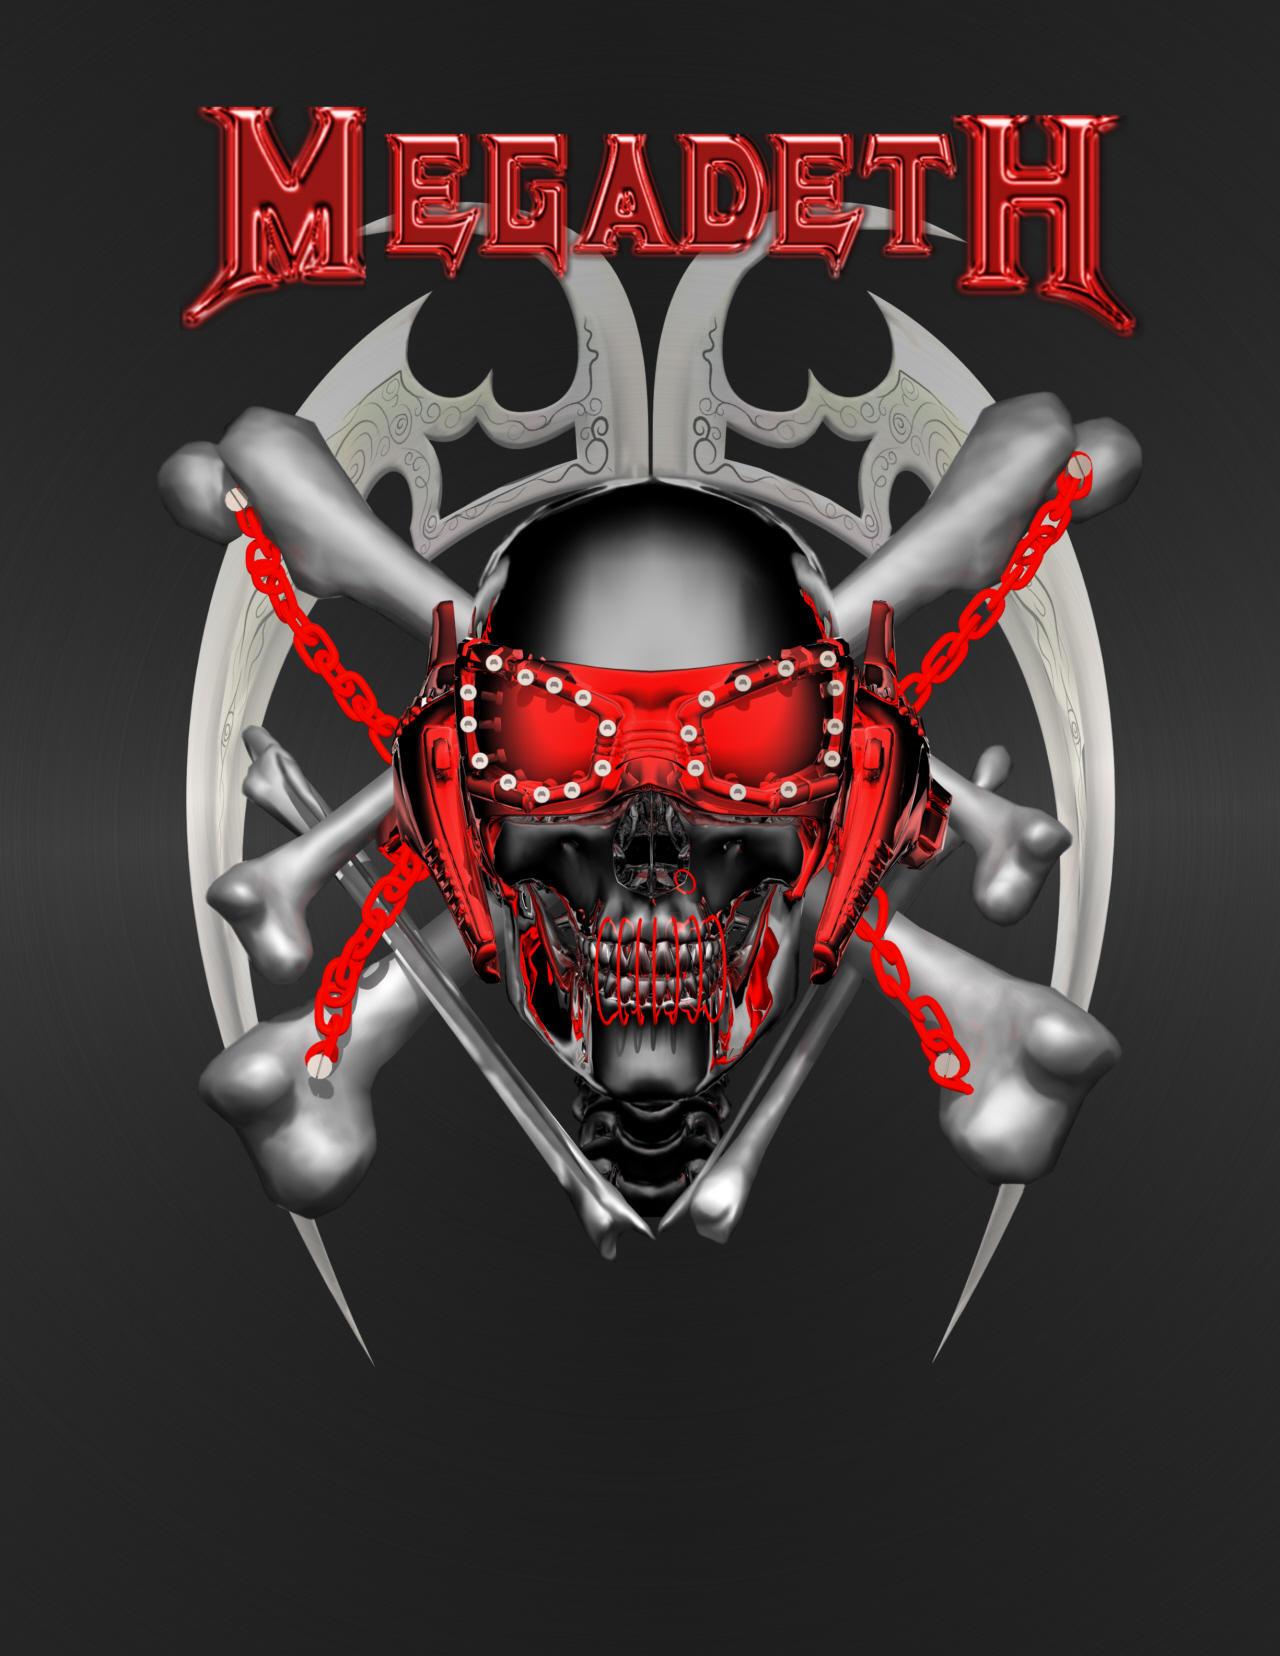 Megadeth by Casperium